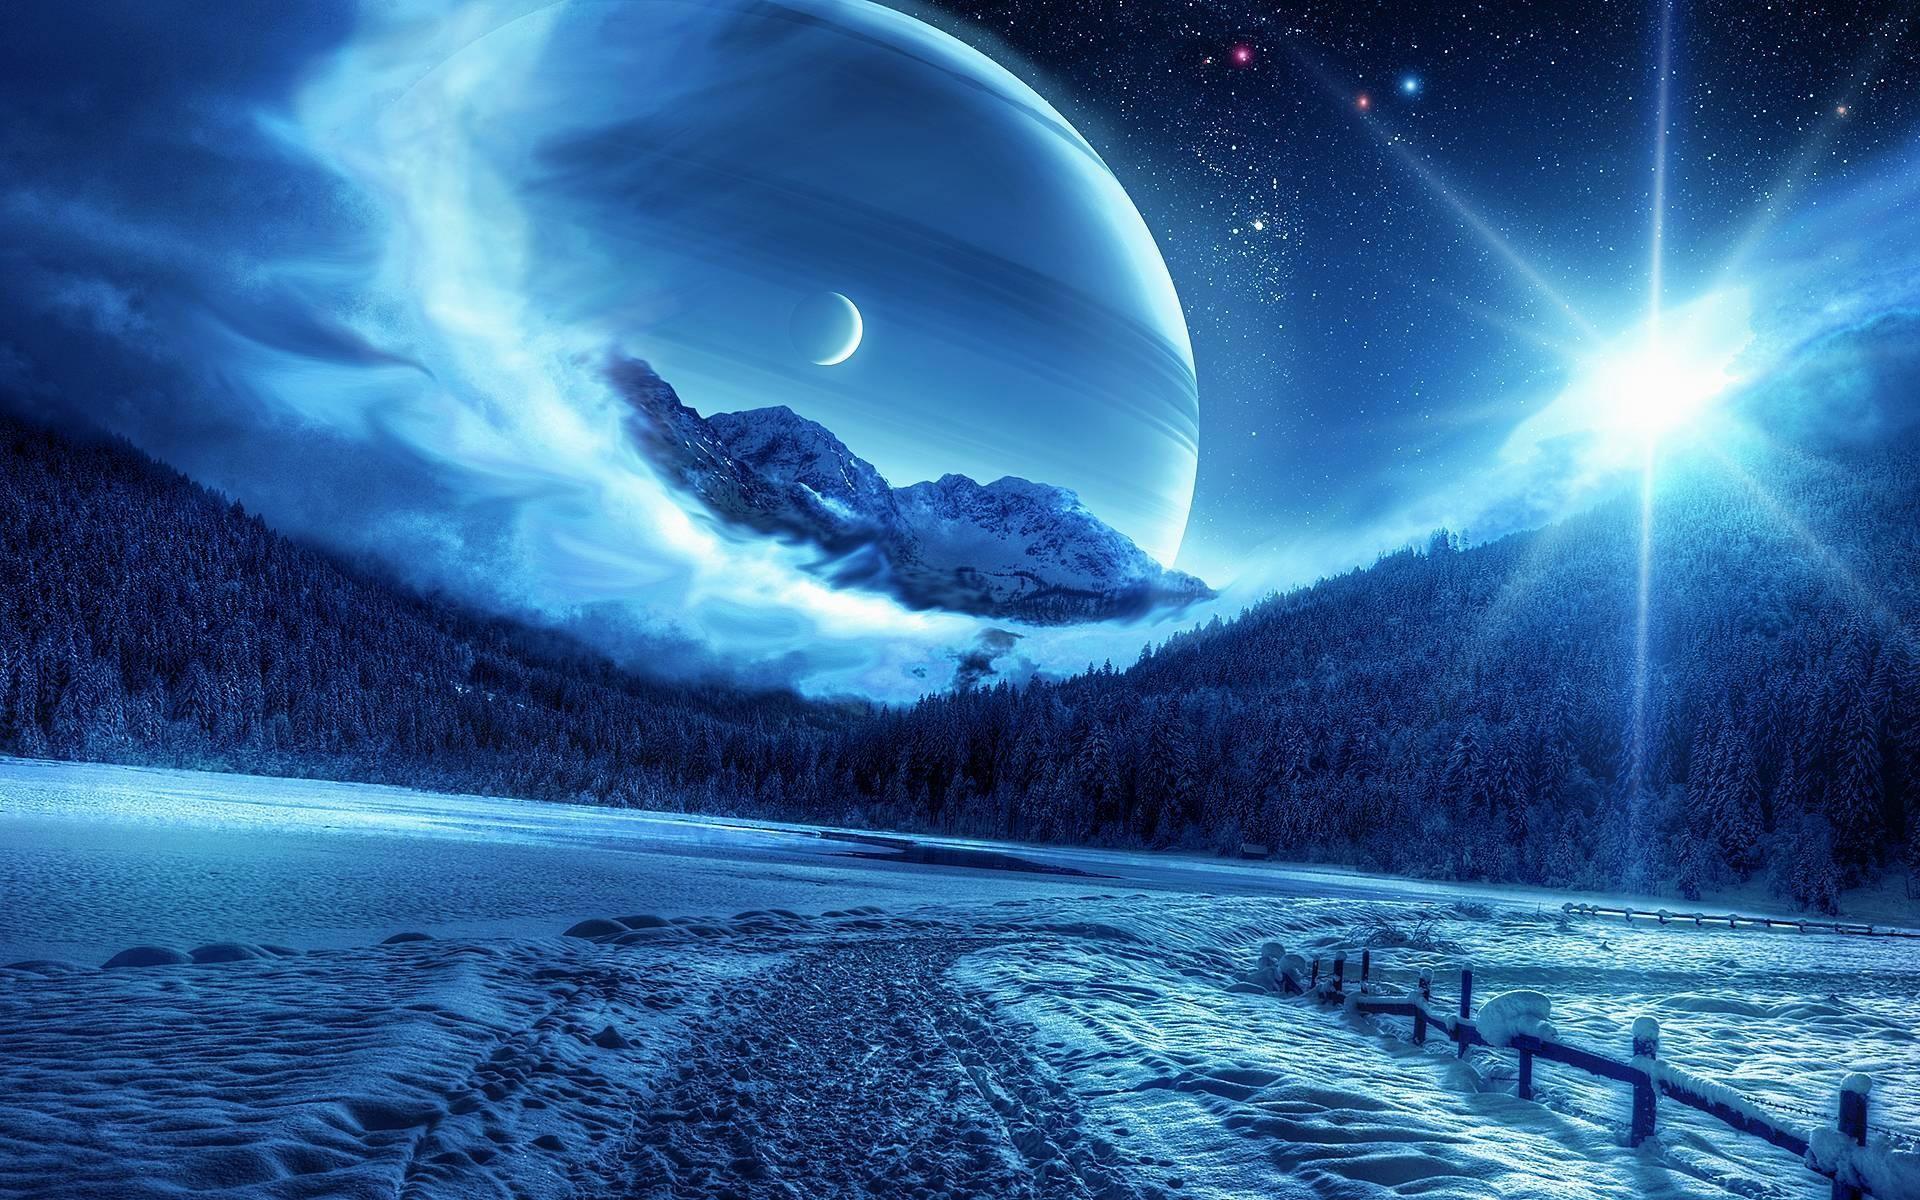 wallpaper.wiki-HD-Sun-Moon-Stars-Wallpaper-PIC-